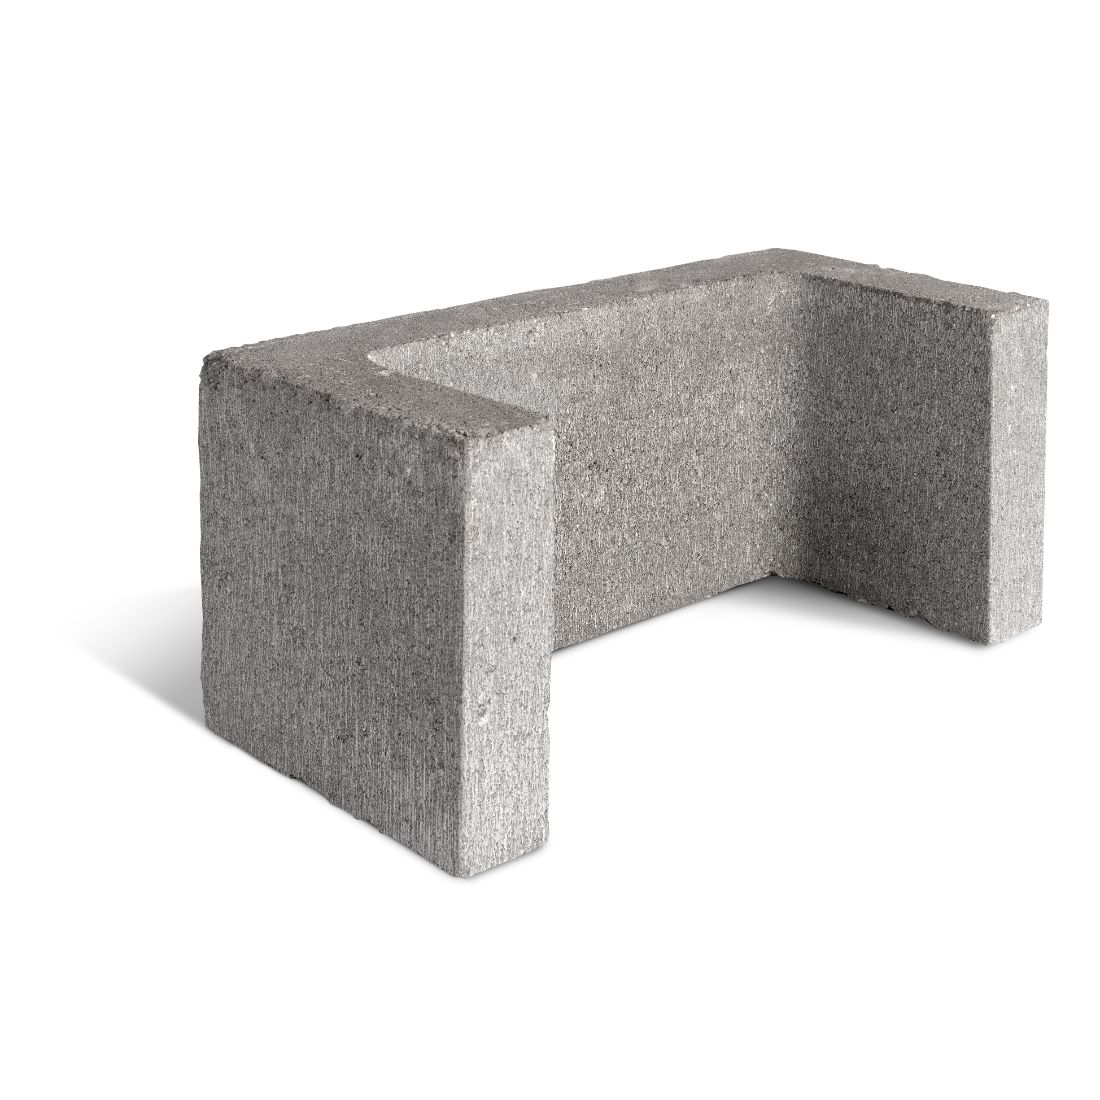 20.34 Pilaster Type C Block 390 x 190 x 190mm